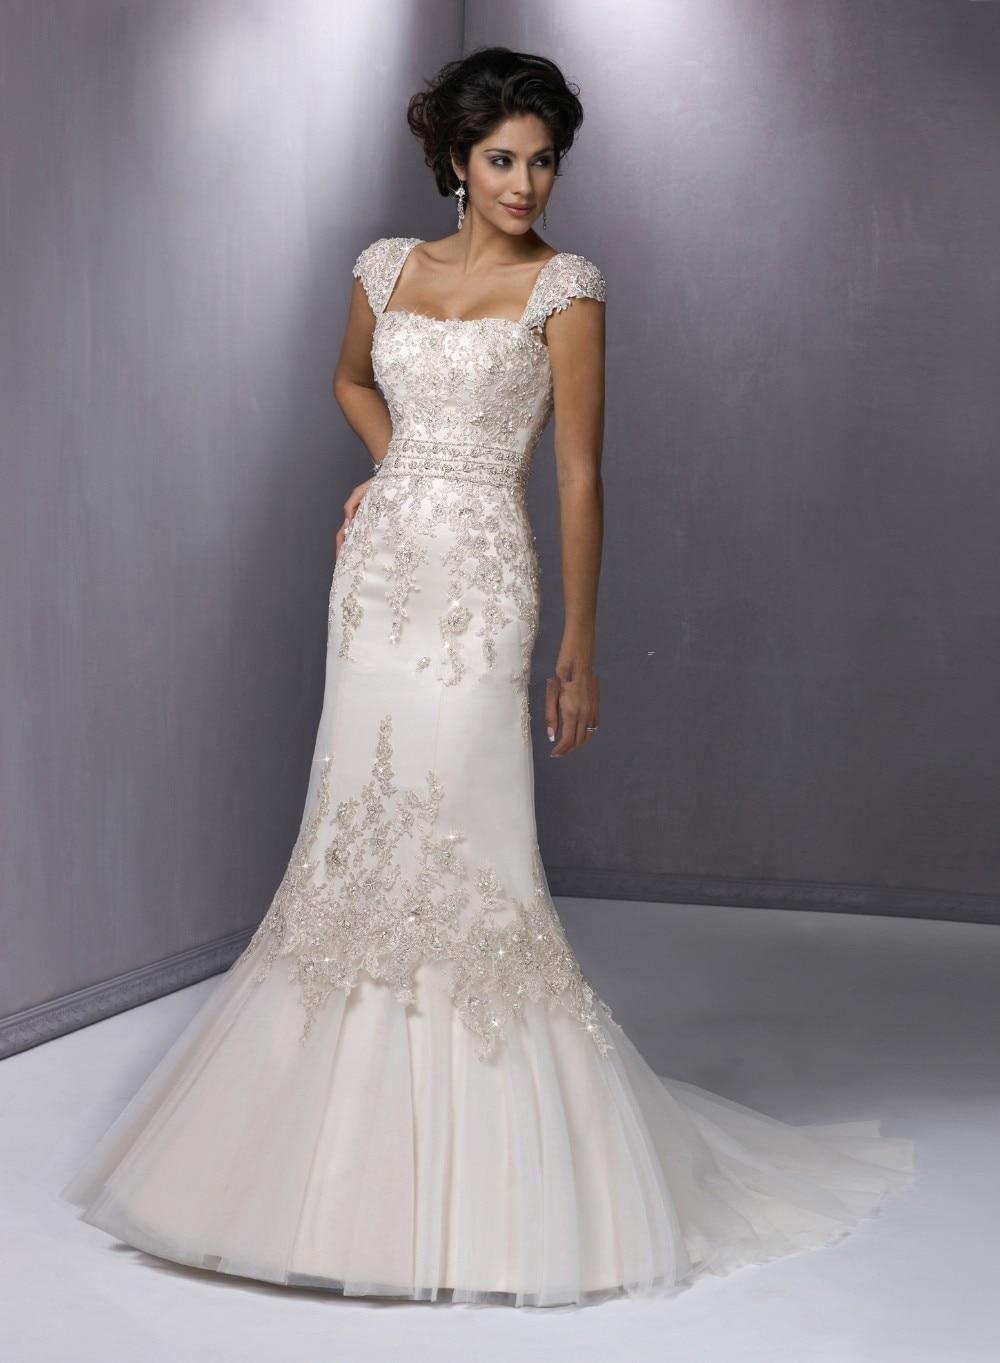 Vestido De Novia Custom Cap Sleeve A-Line Lace Appliques Vestidos De Casamento Bridal Gown 2018 Mother Of The Bride Dresses